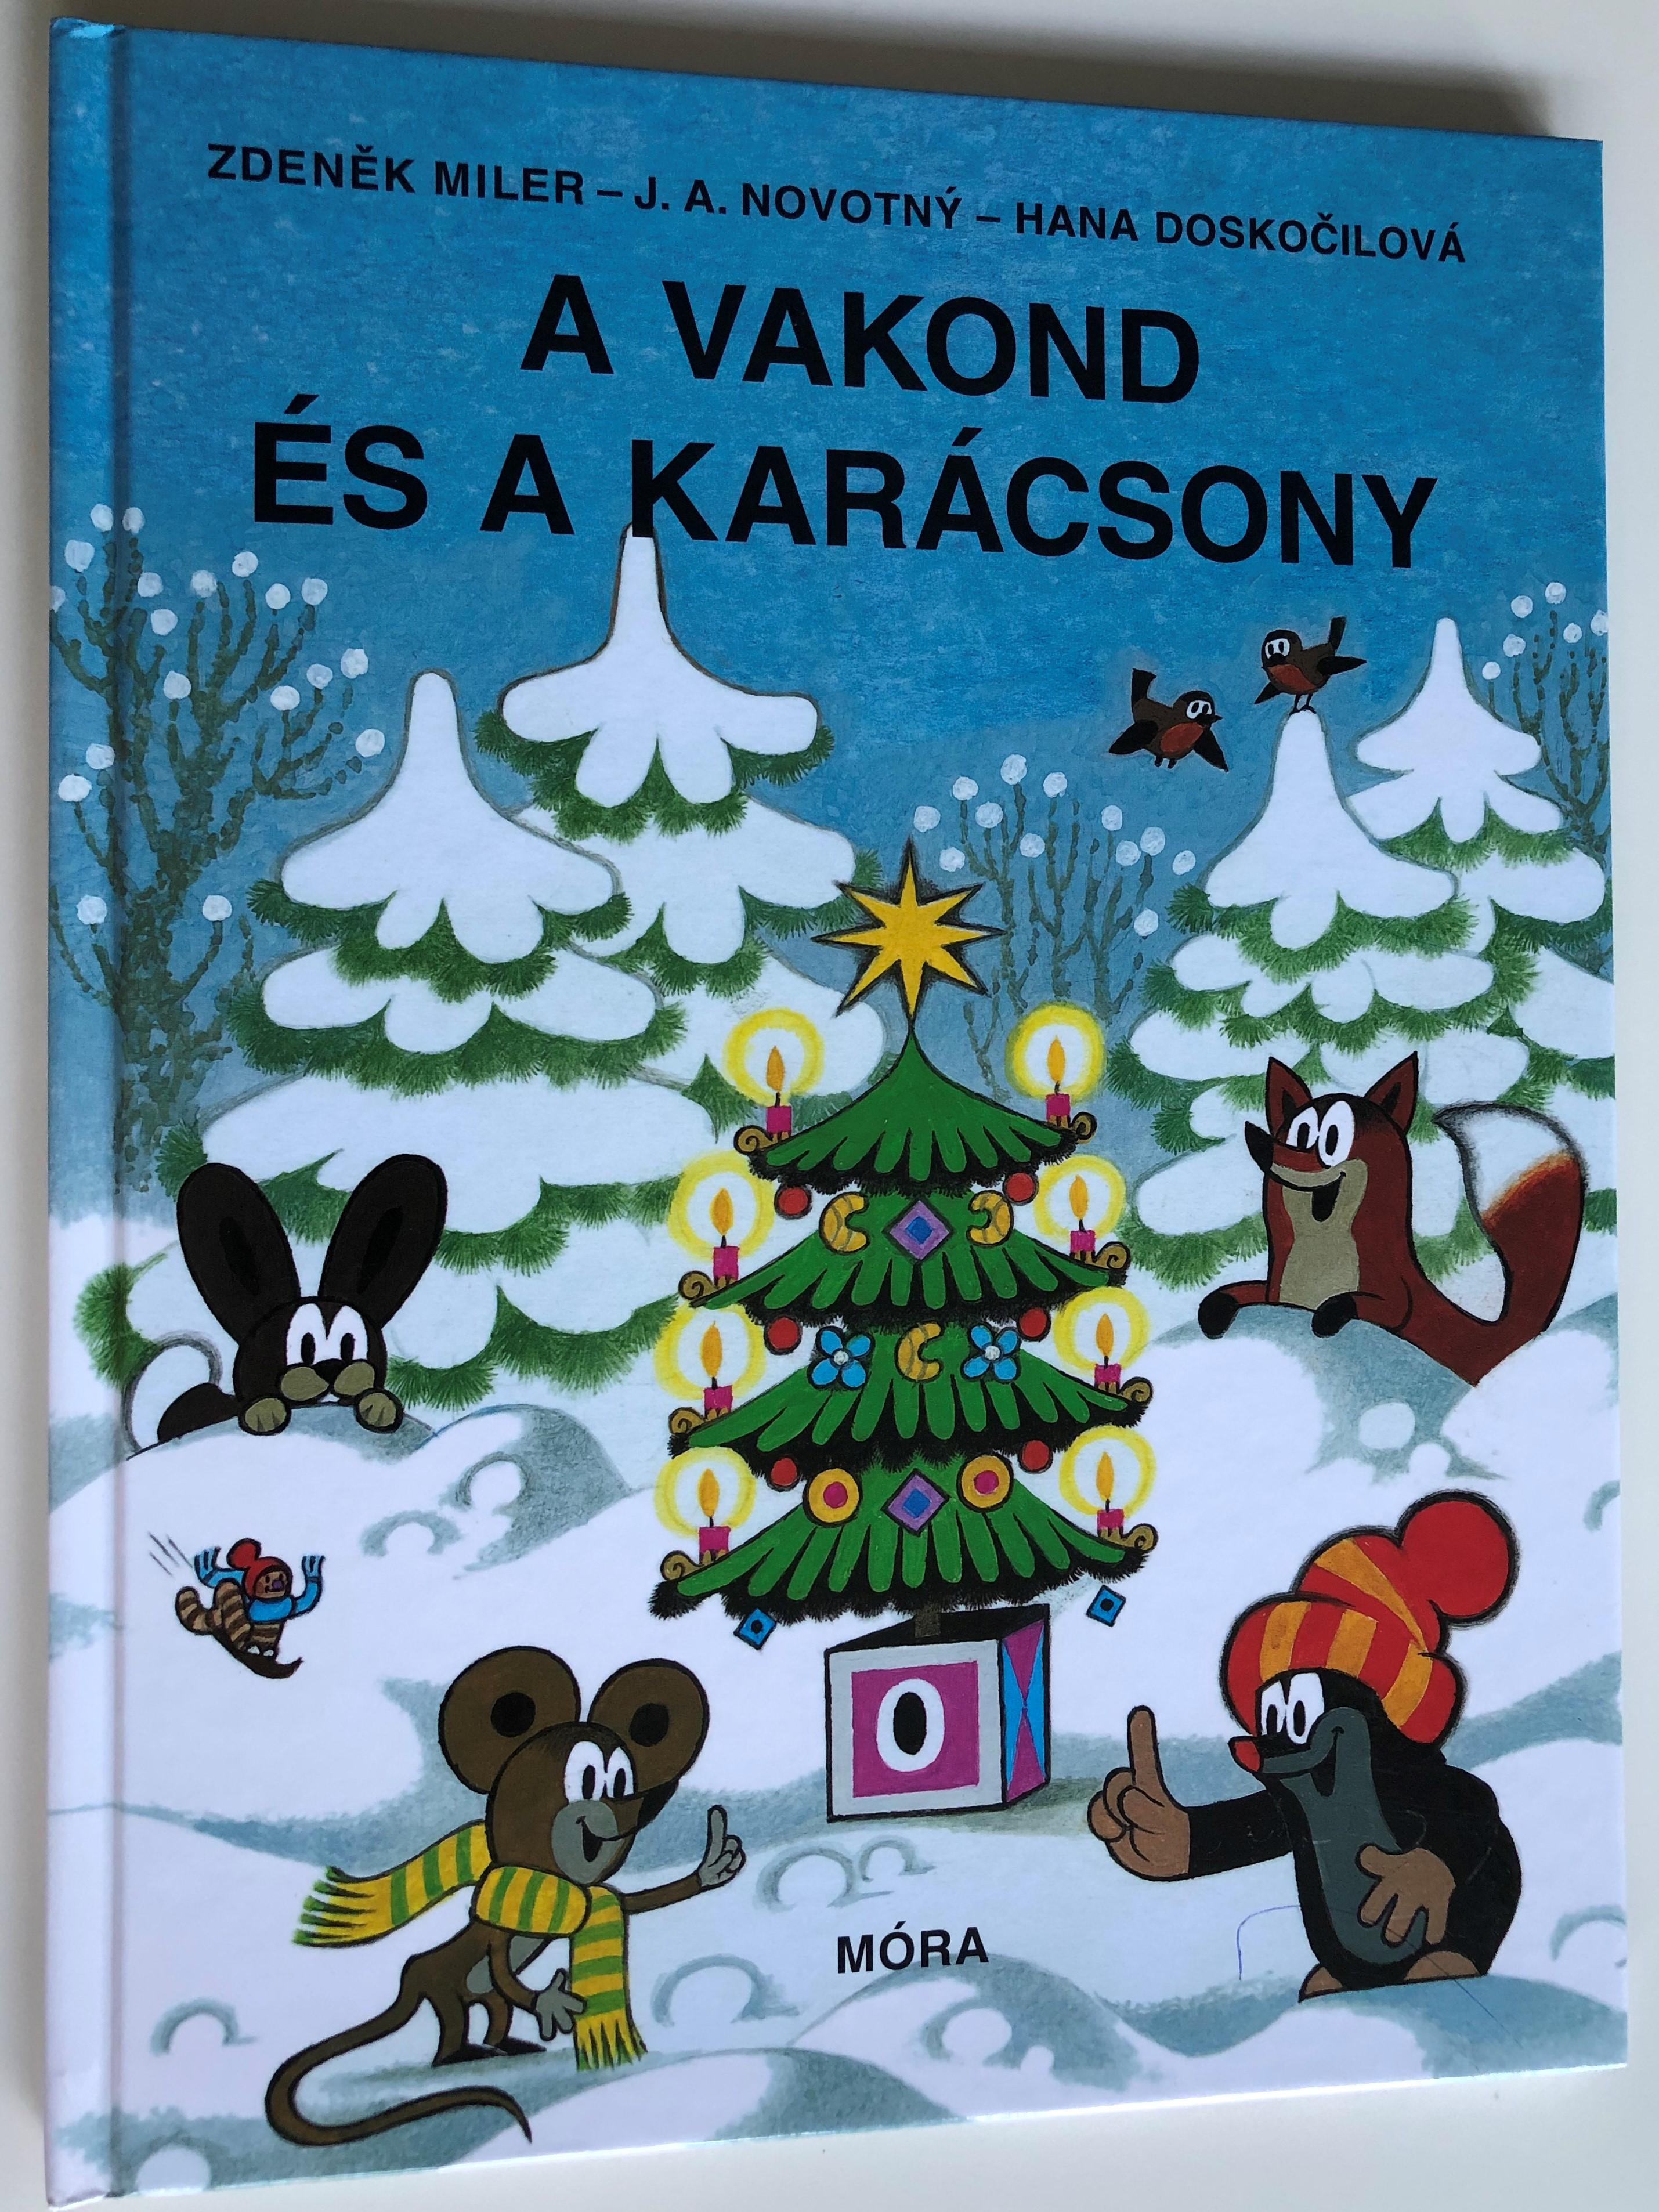 a-vakond-s-a-kar-csony-by-zdenek-miler-j.a.-novotny-hana-dosko-ilov-hungarian-translation-of-krtek-a-v-noce-3rd-edition-m-ra-k-nyvkiad-2017-1-.jpg